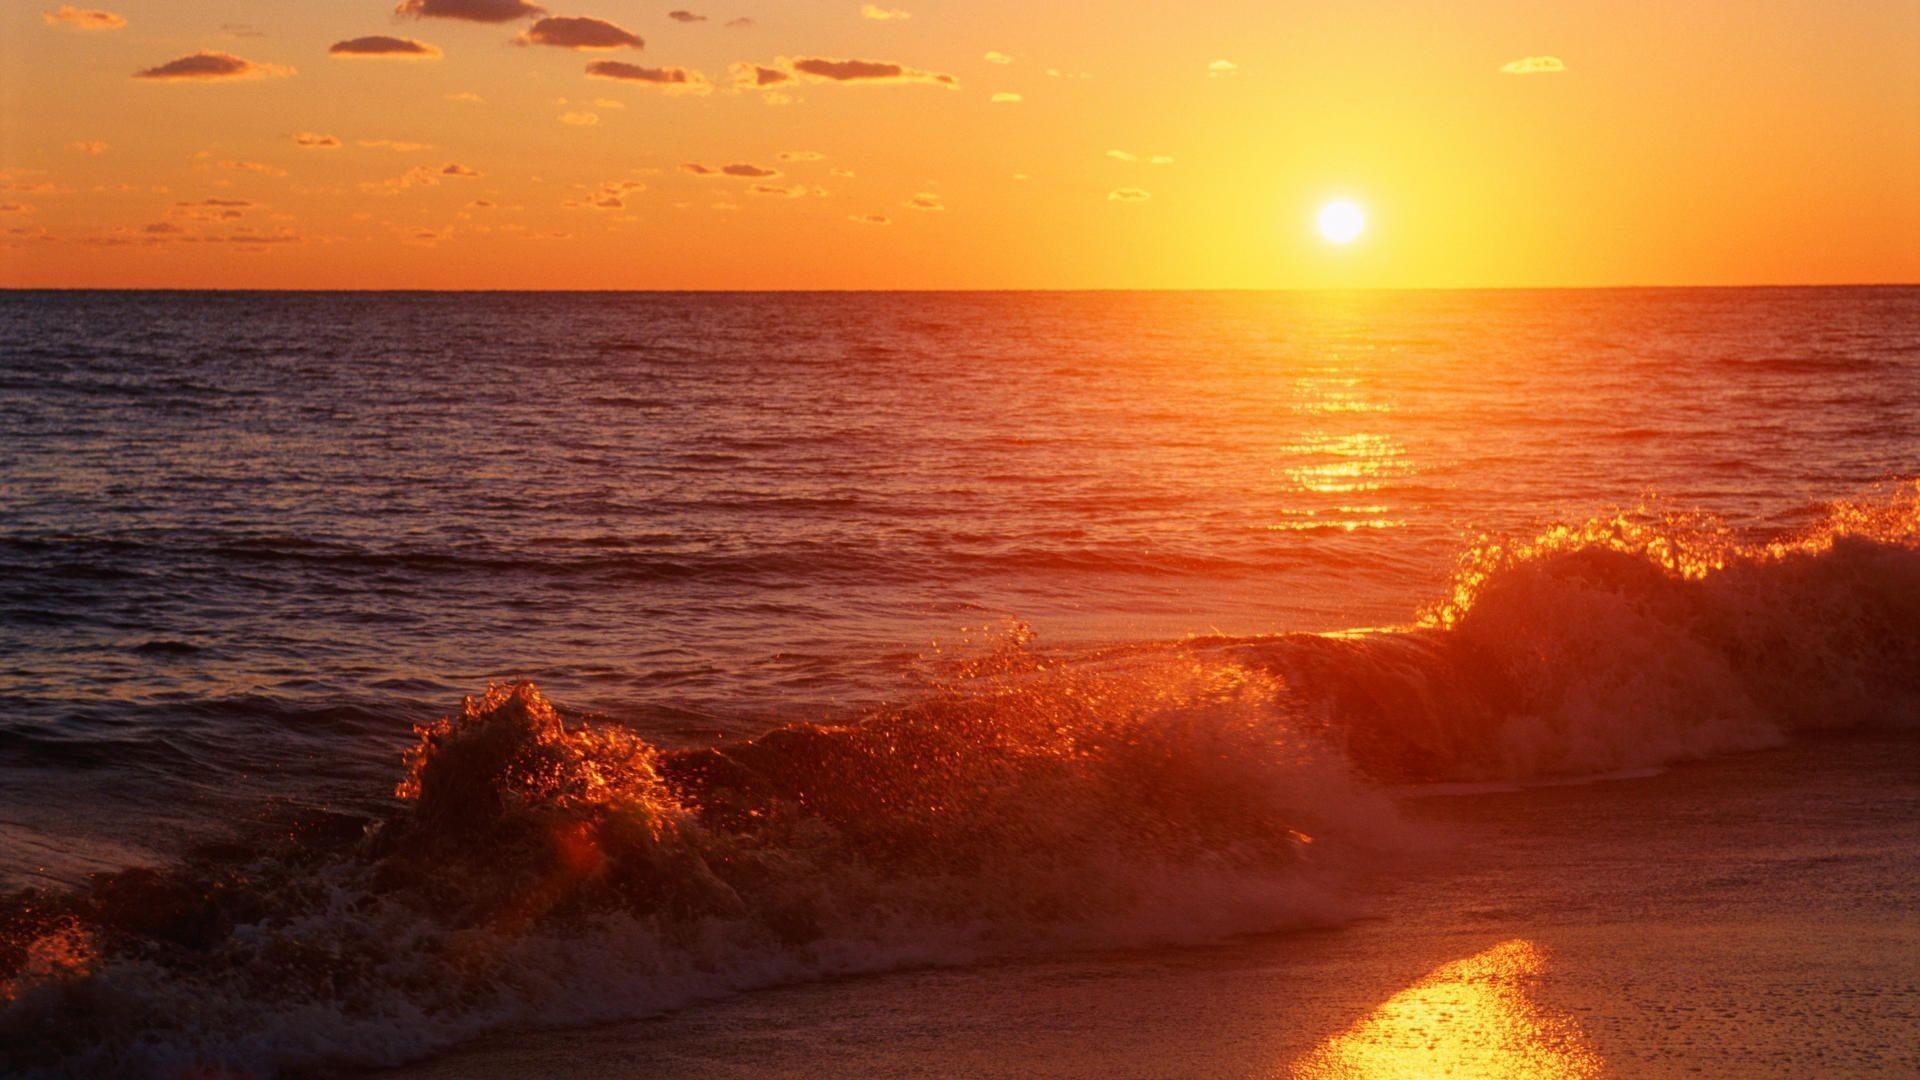 tags sunset 26 pics california 377 pics beach 40 pics pismo beach is a .